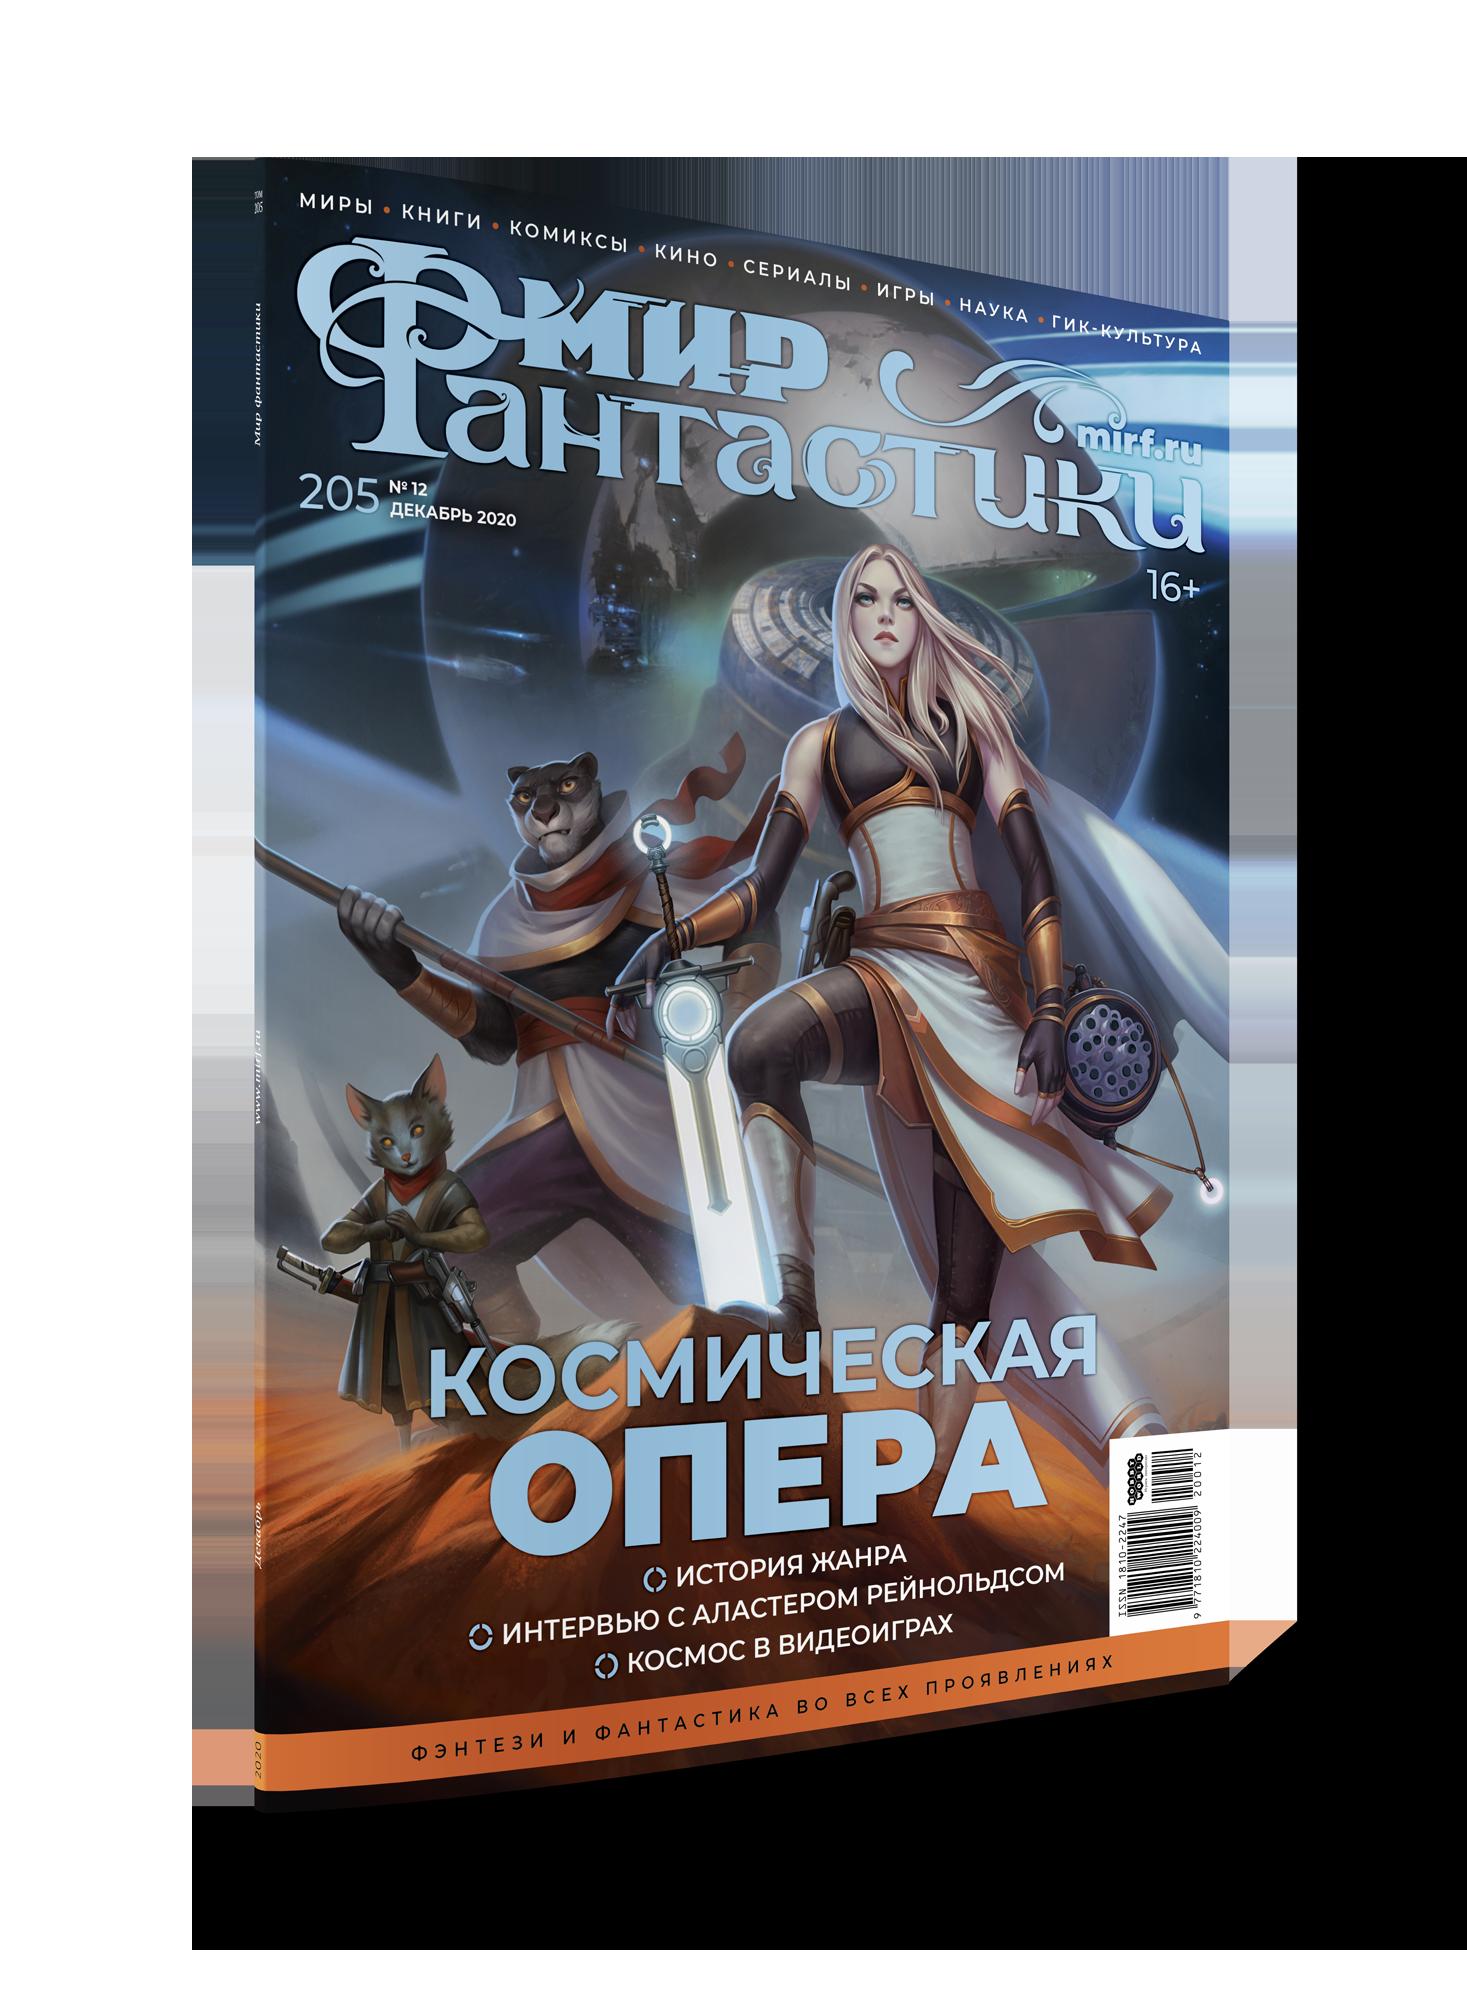 Мир фантастики №205 (декабрь 2020) 1